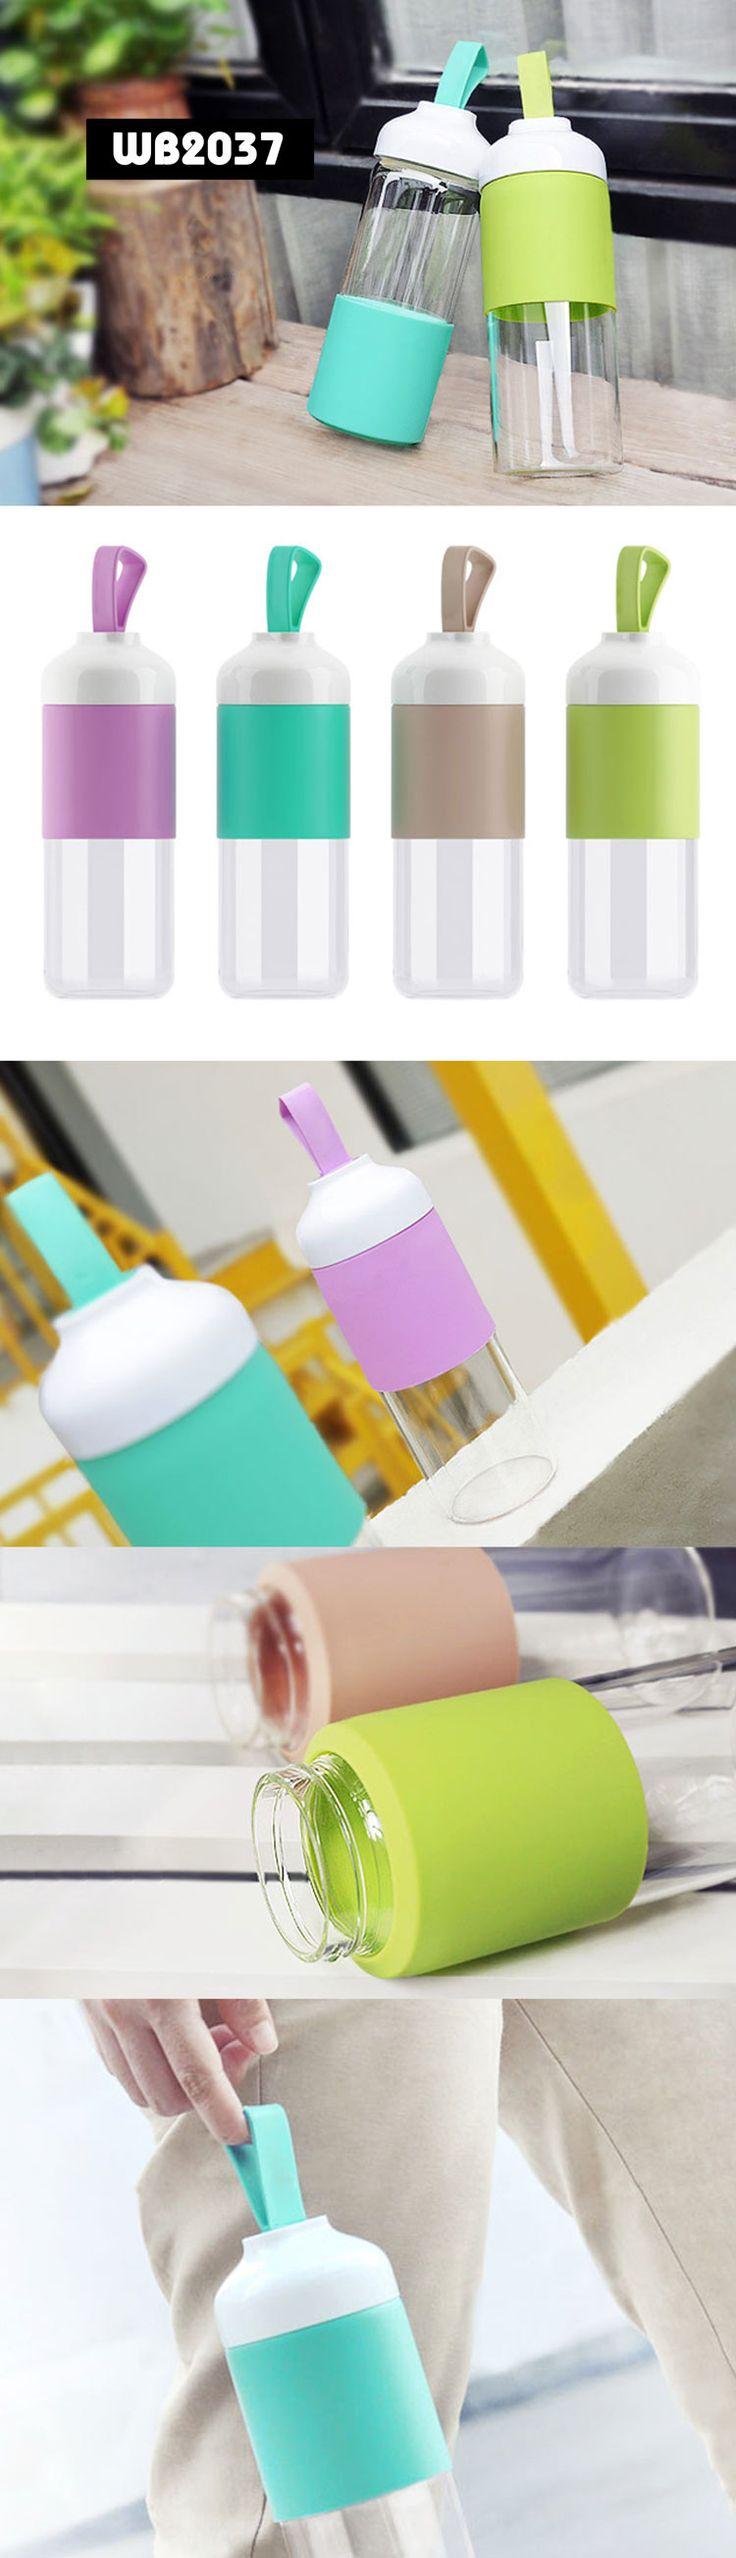 Glass Bottle with Handle Description:        ● Material:ABS lid+silicon cover+sealed glass bottle    ● Size:7.3*7.3*24.2CM www.ideagroupigm.com